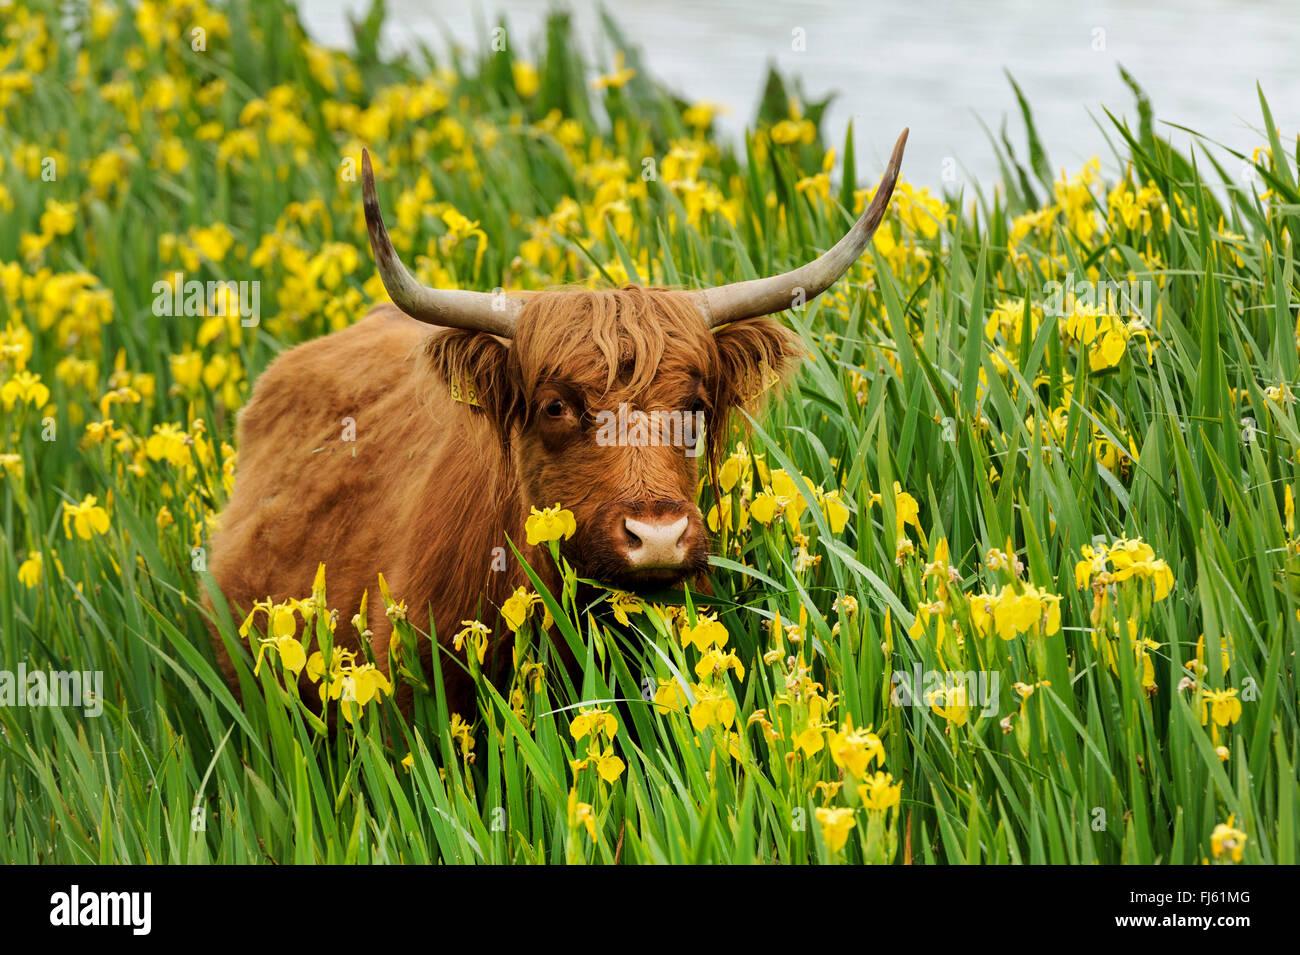 Scottish Highland Cattle, Kyloe (Bos primigenius f. taurus), in a population of yellow iris (Iris pseudacorus), - Stock Image